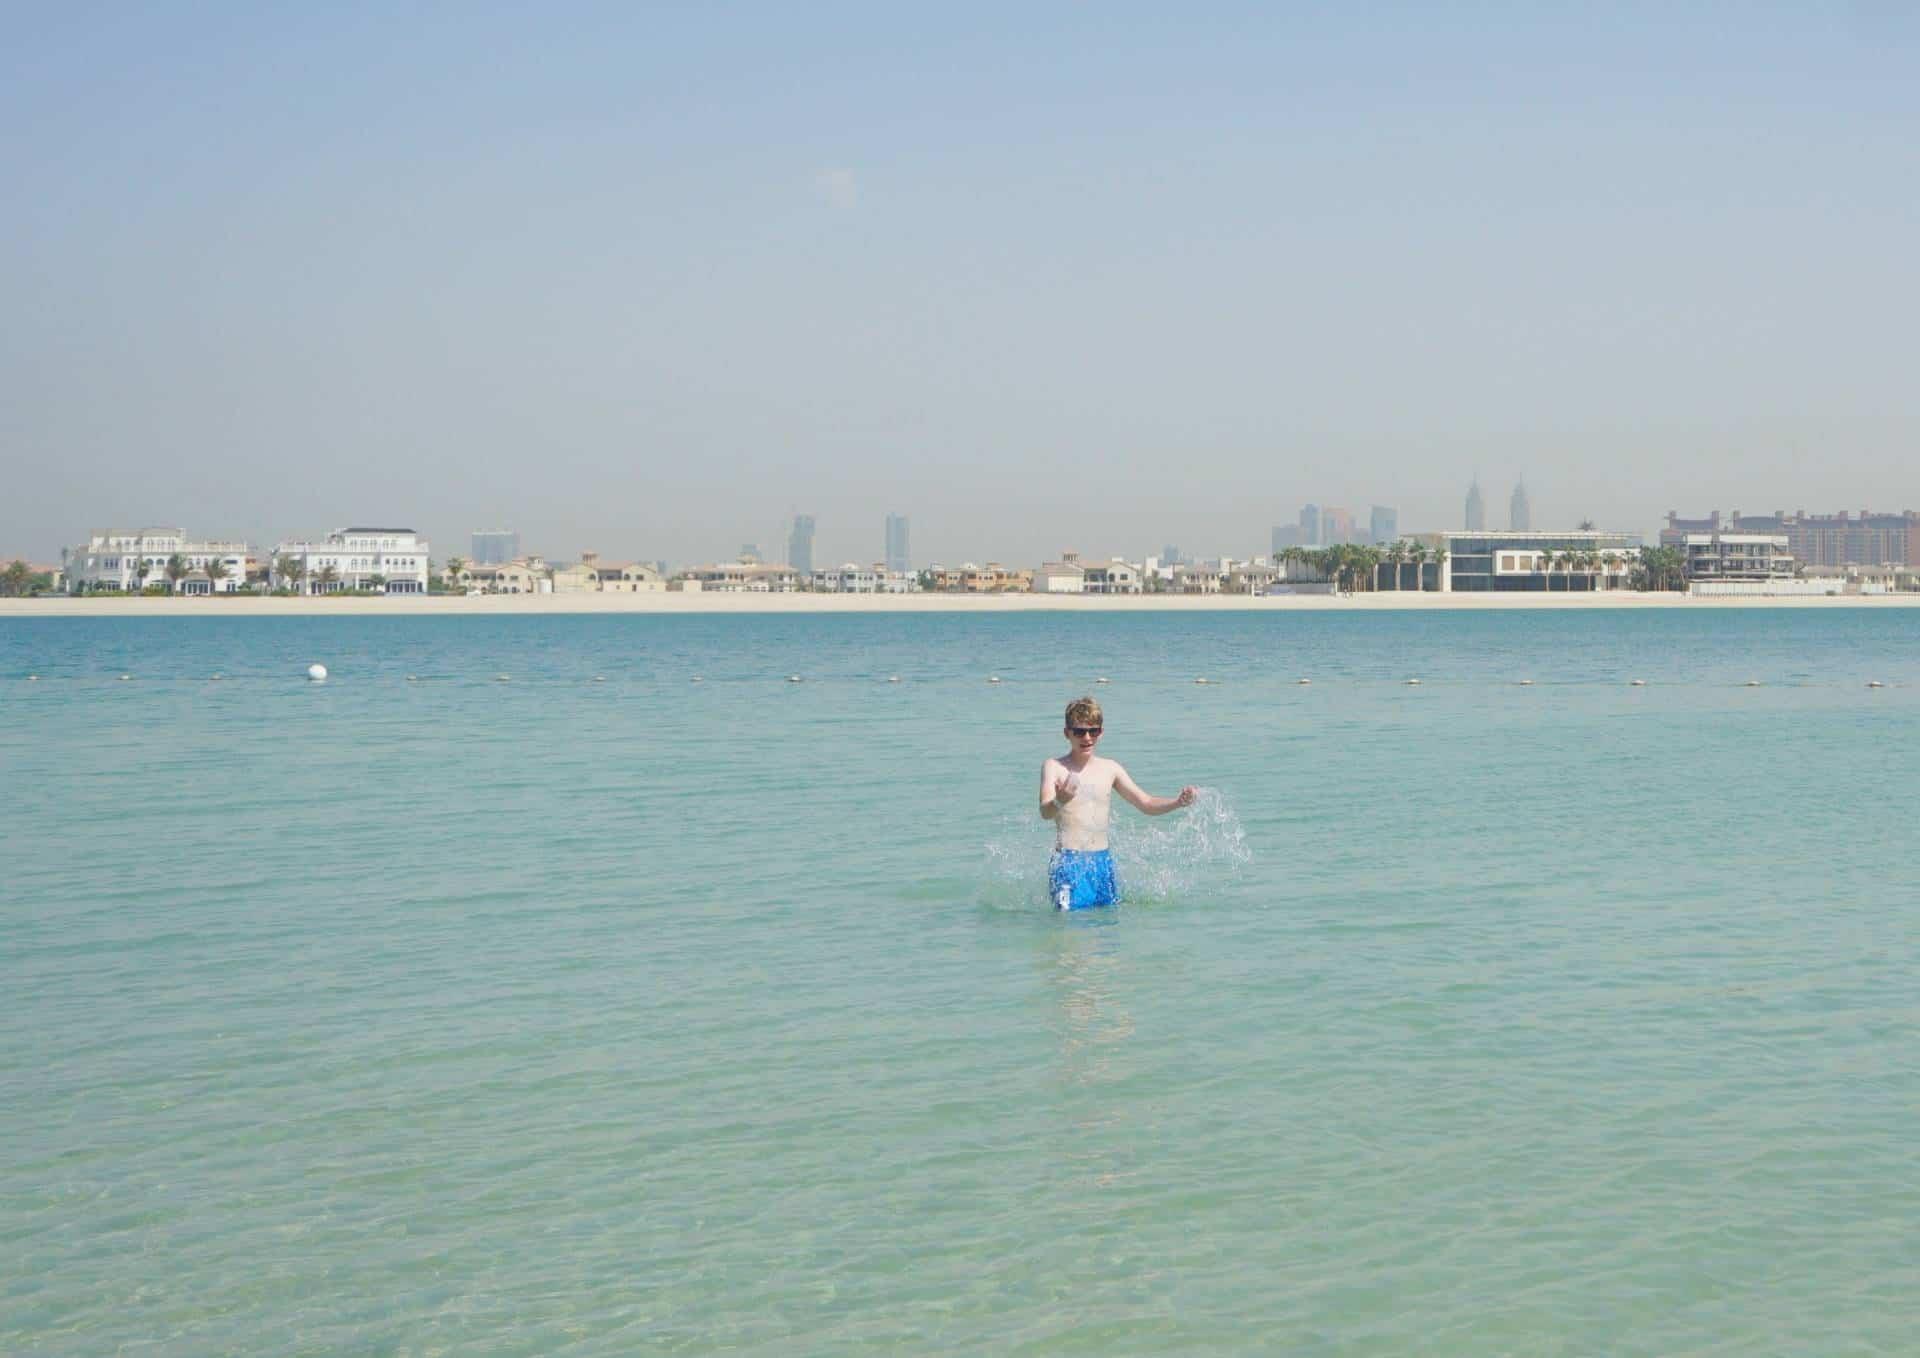 Our Day At Atlantis The Palm, Dubai